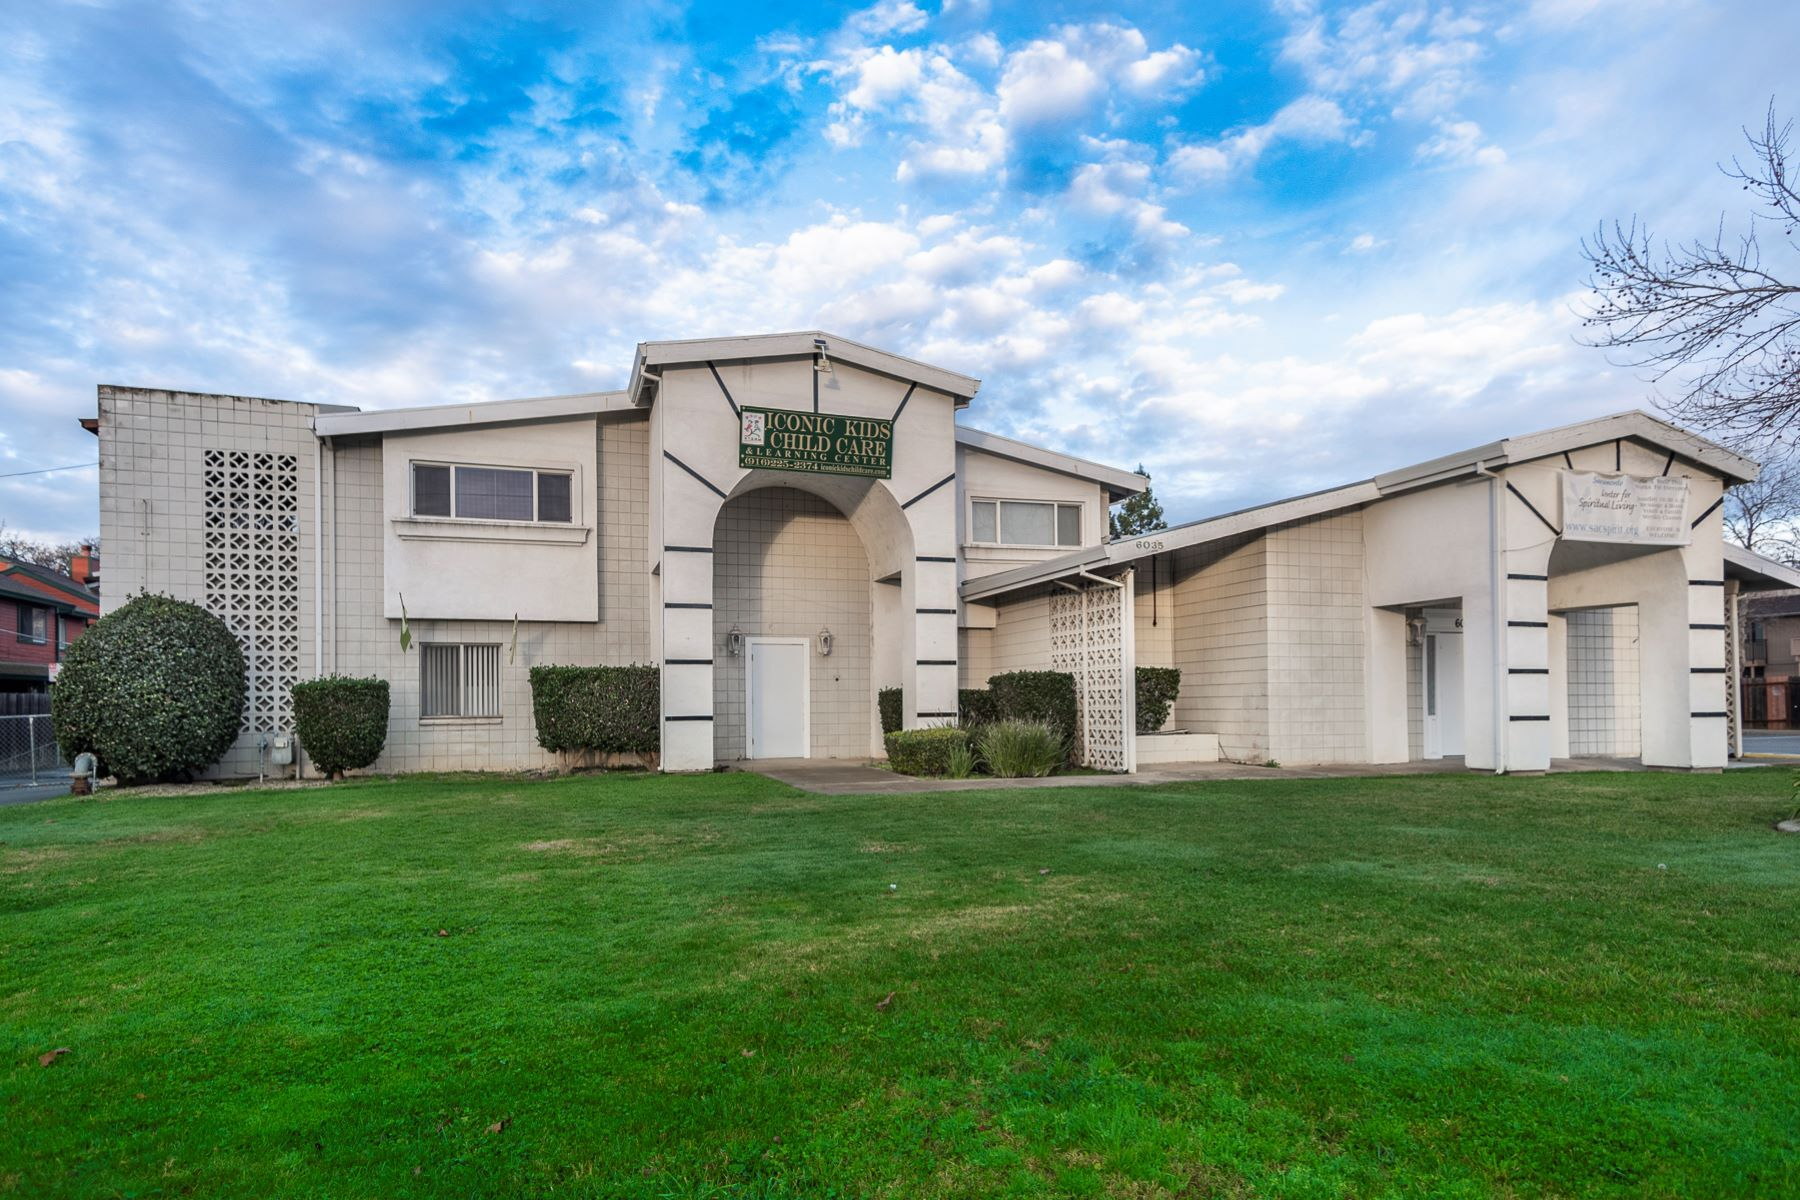 Apartments for Sale at 6035 Main Avenue, Orangevale, CA 95662 6035 Main Avenue Orangevale, California 95662 United States